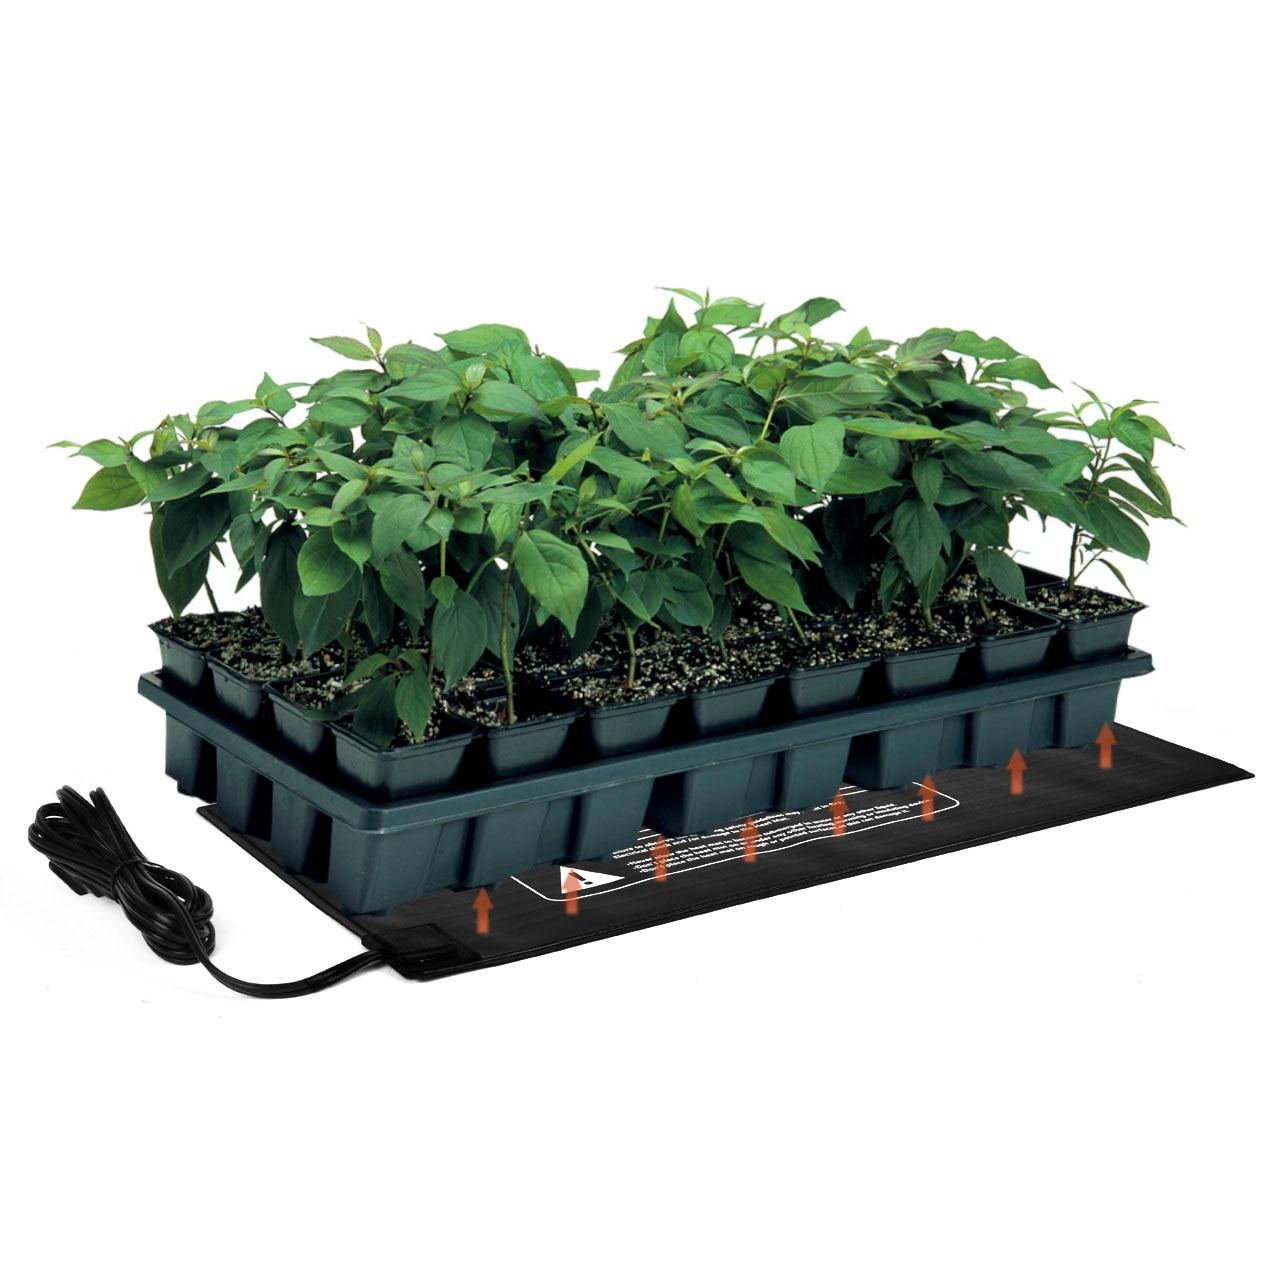 Seedling Heating Pad 10 X20 75